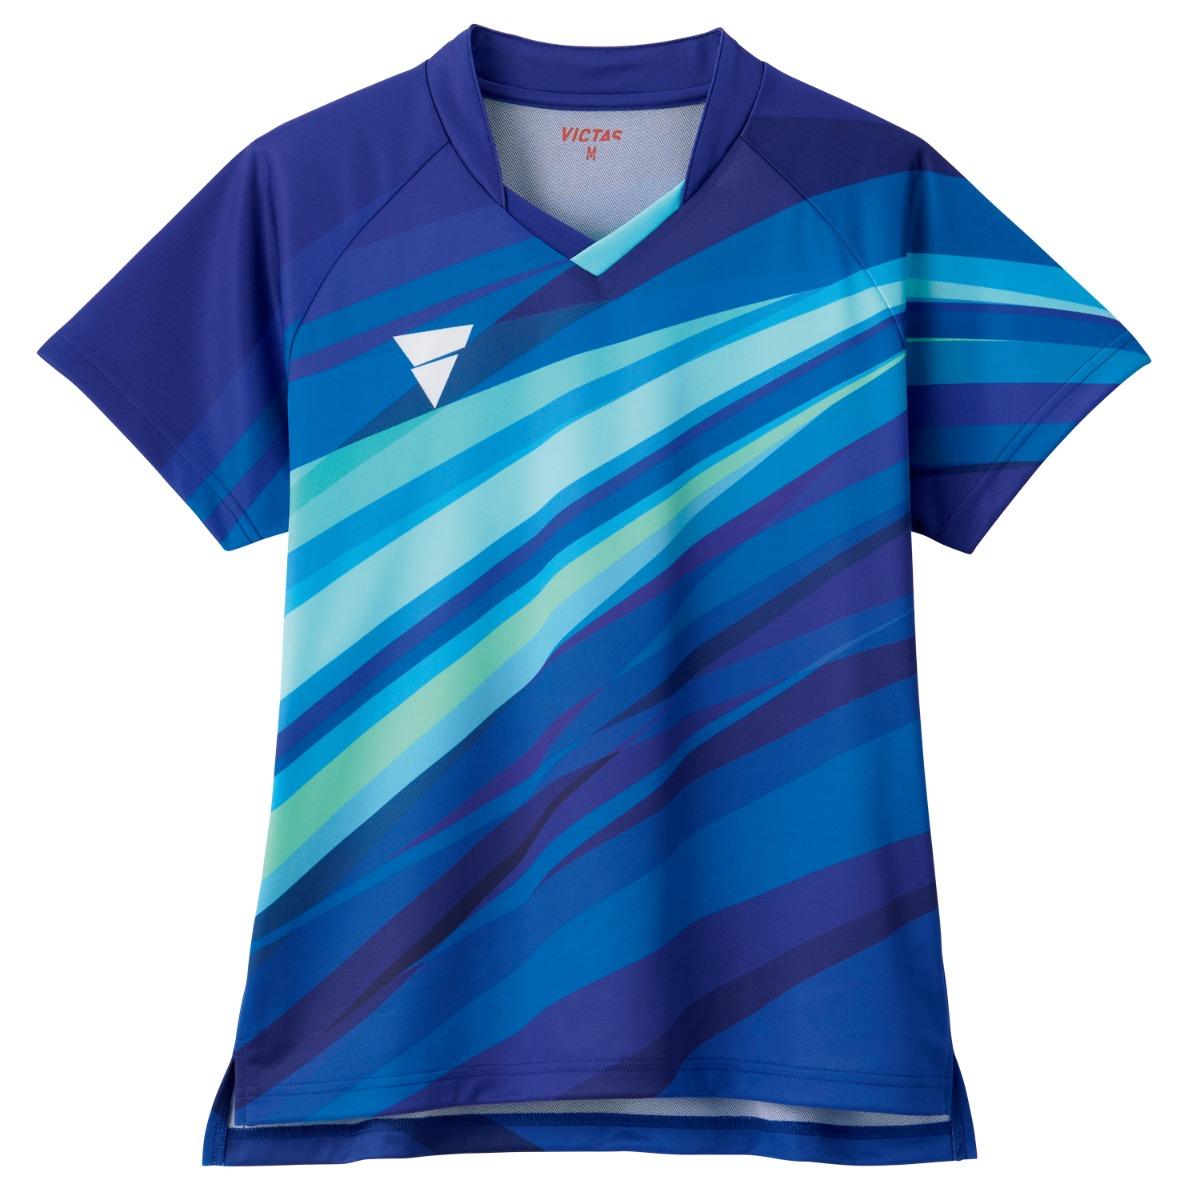 VICTAS ヴィクタス VICTAS PLAY ヴィクタスプレイ 卓球 ウェア ゲームシャツ ユニフォーム V-OLGS236 V-OSK238